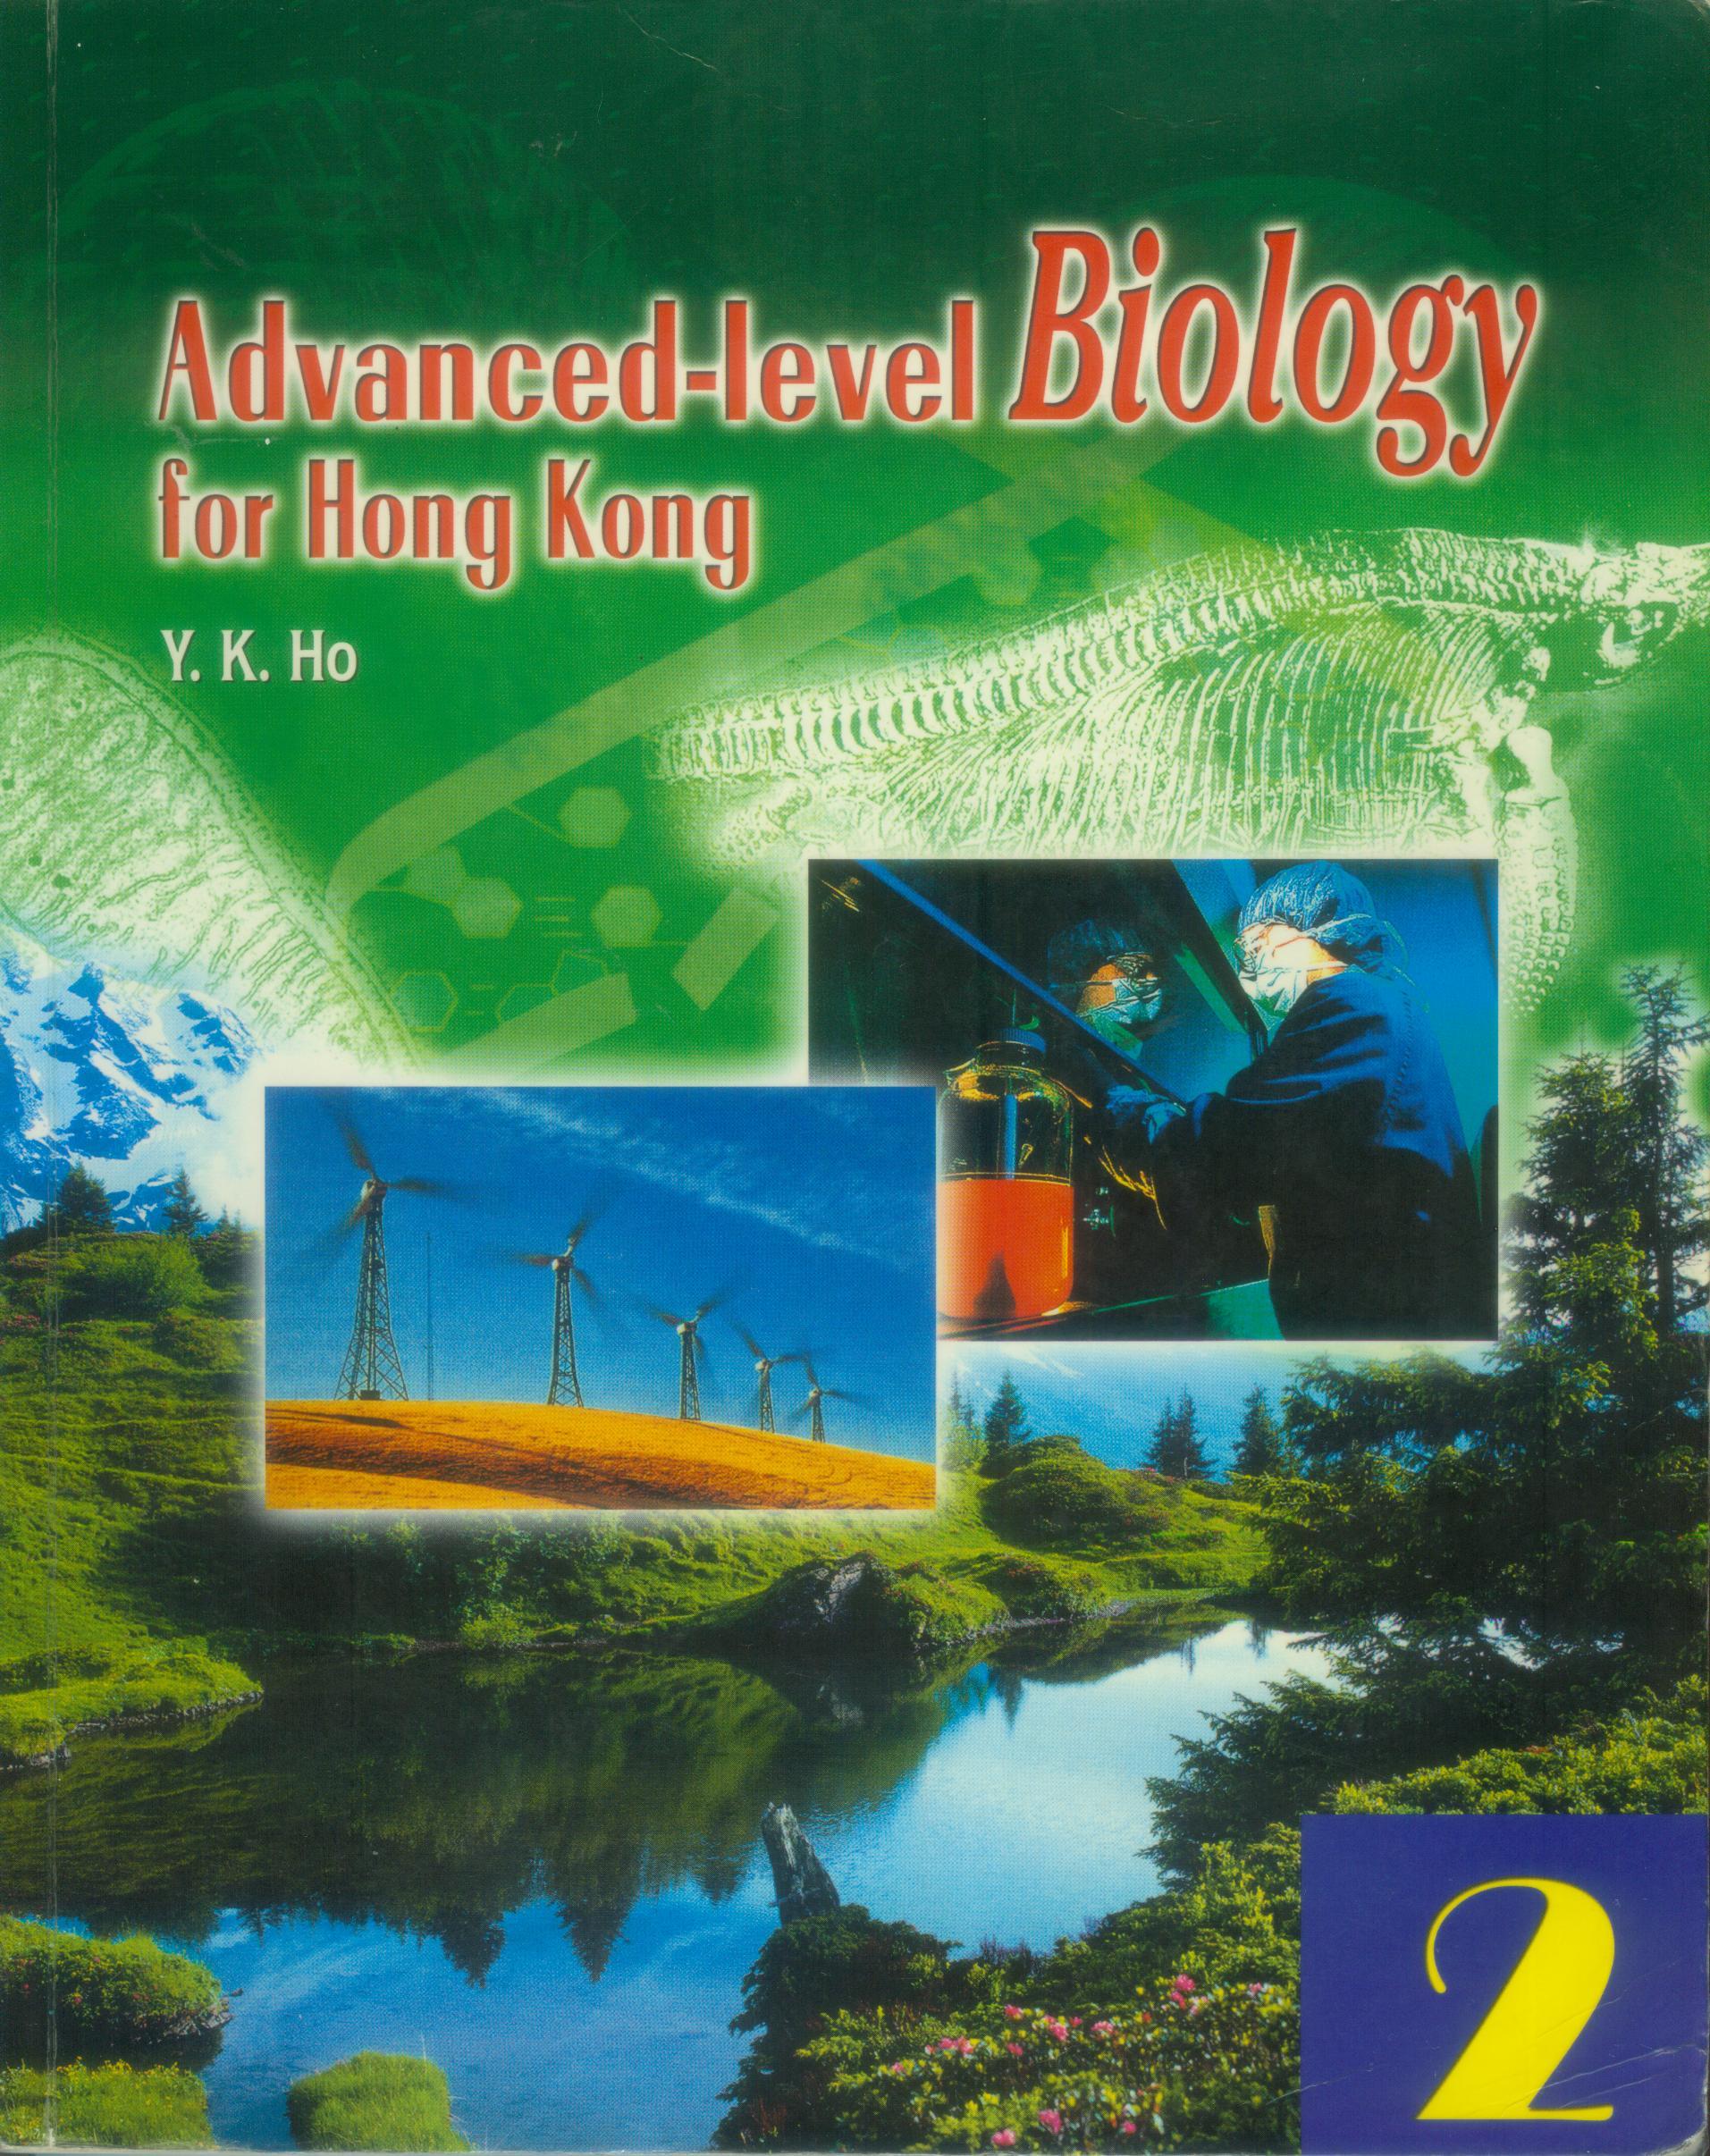 Advanced-level Biology for Hong Kong Volume2